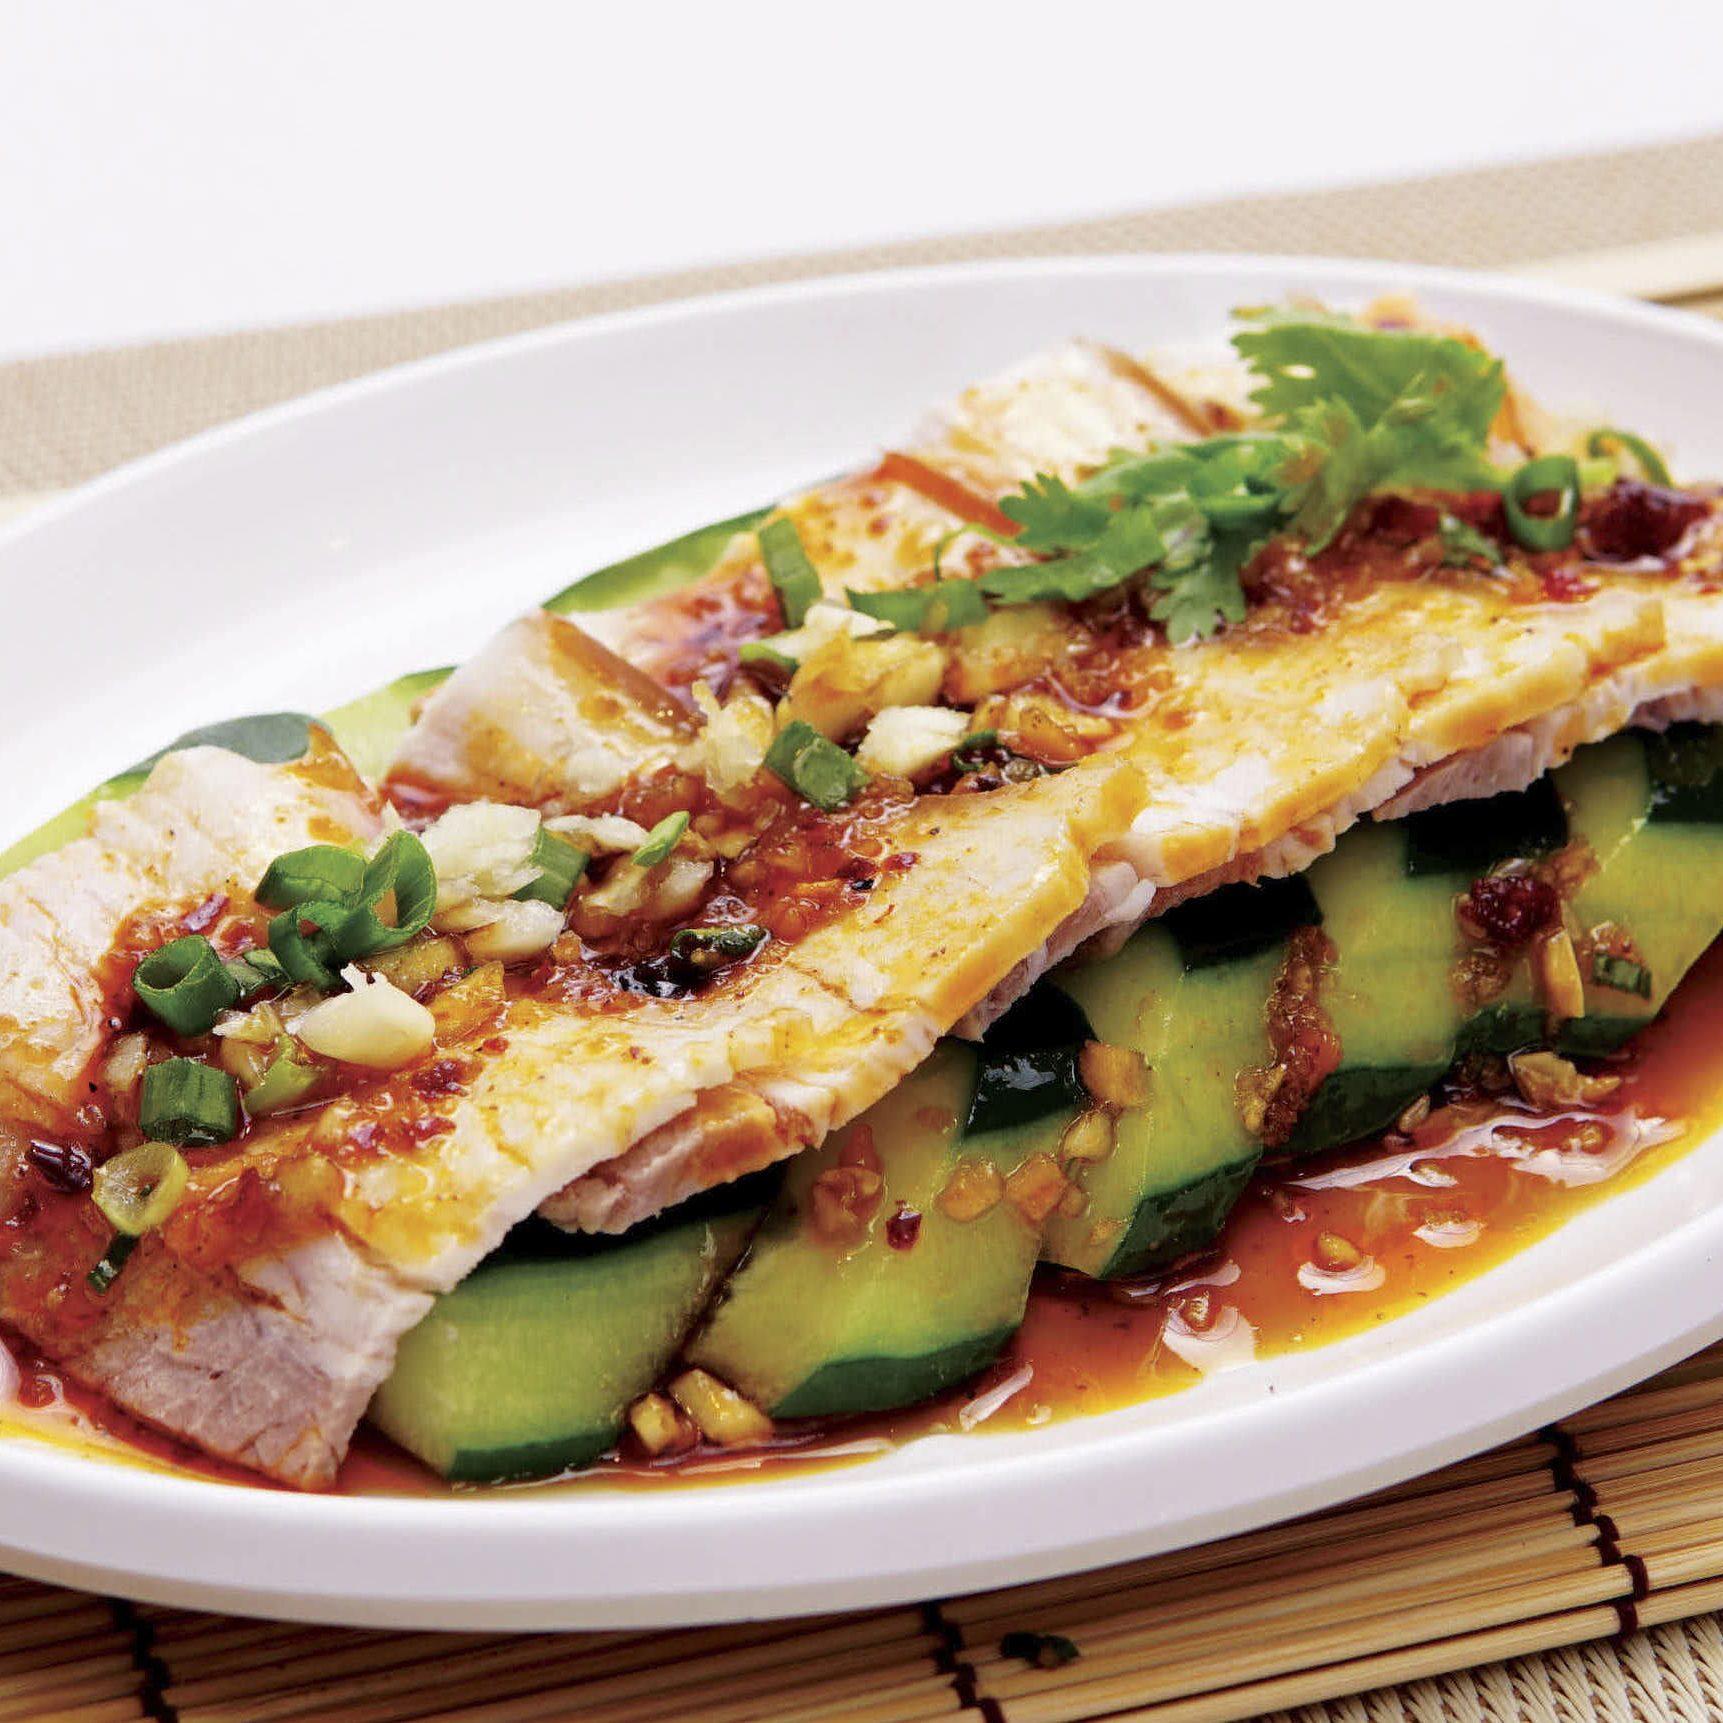 B5 Spicy Sliced Pork Belly Salad